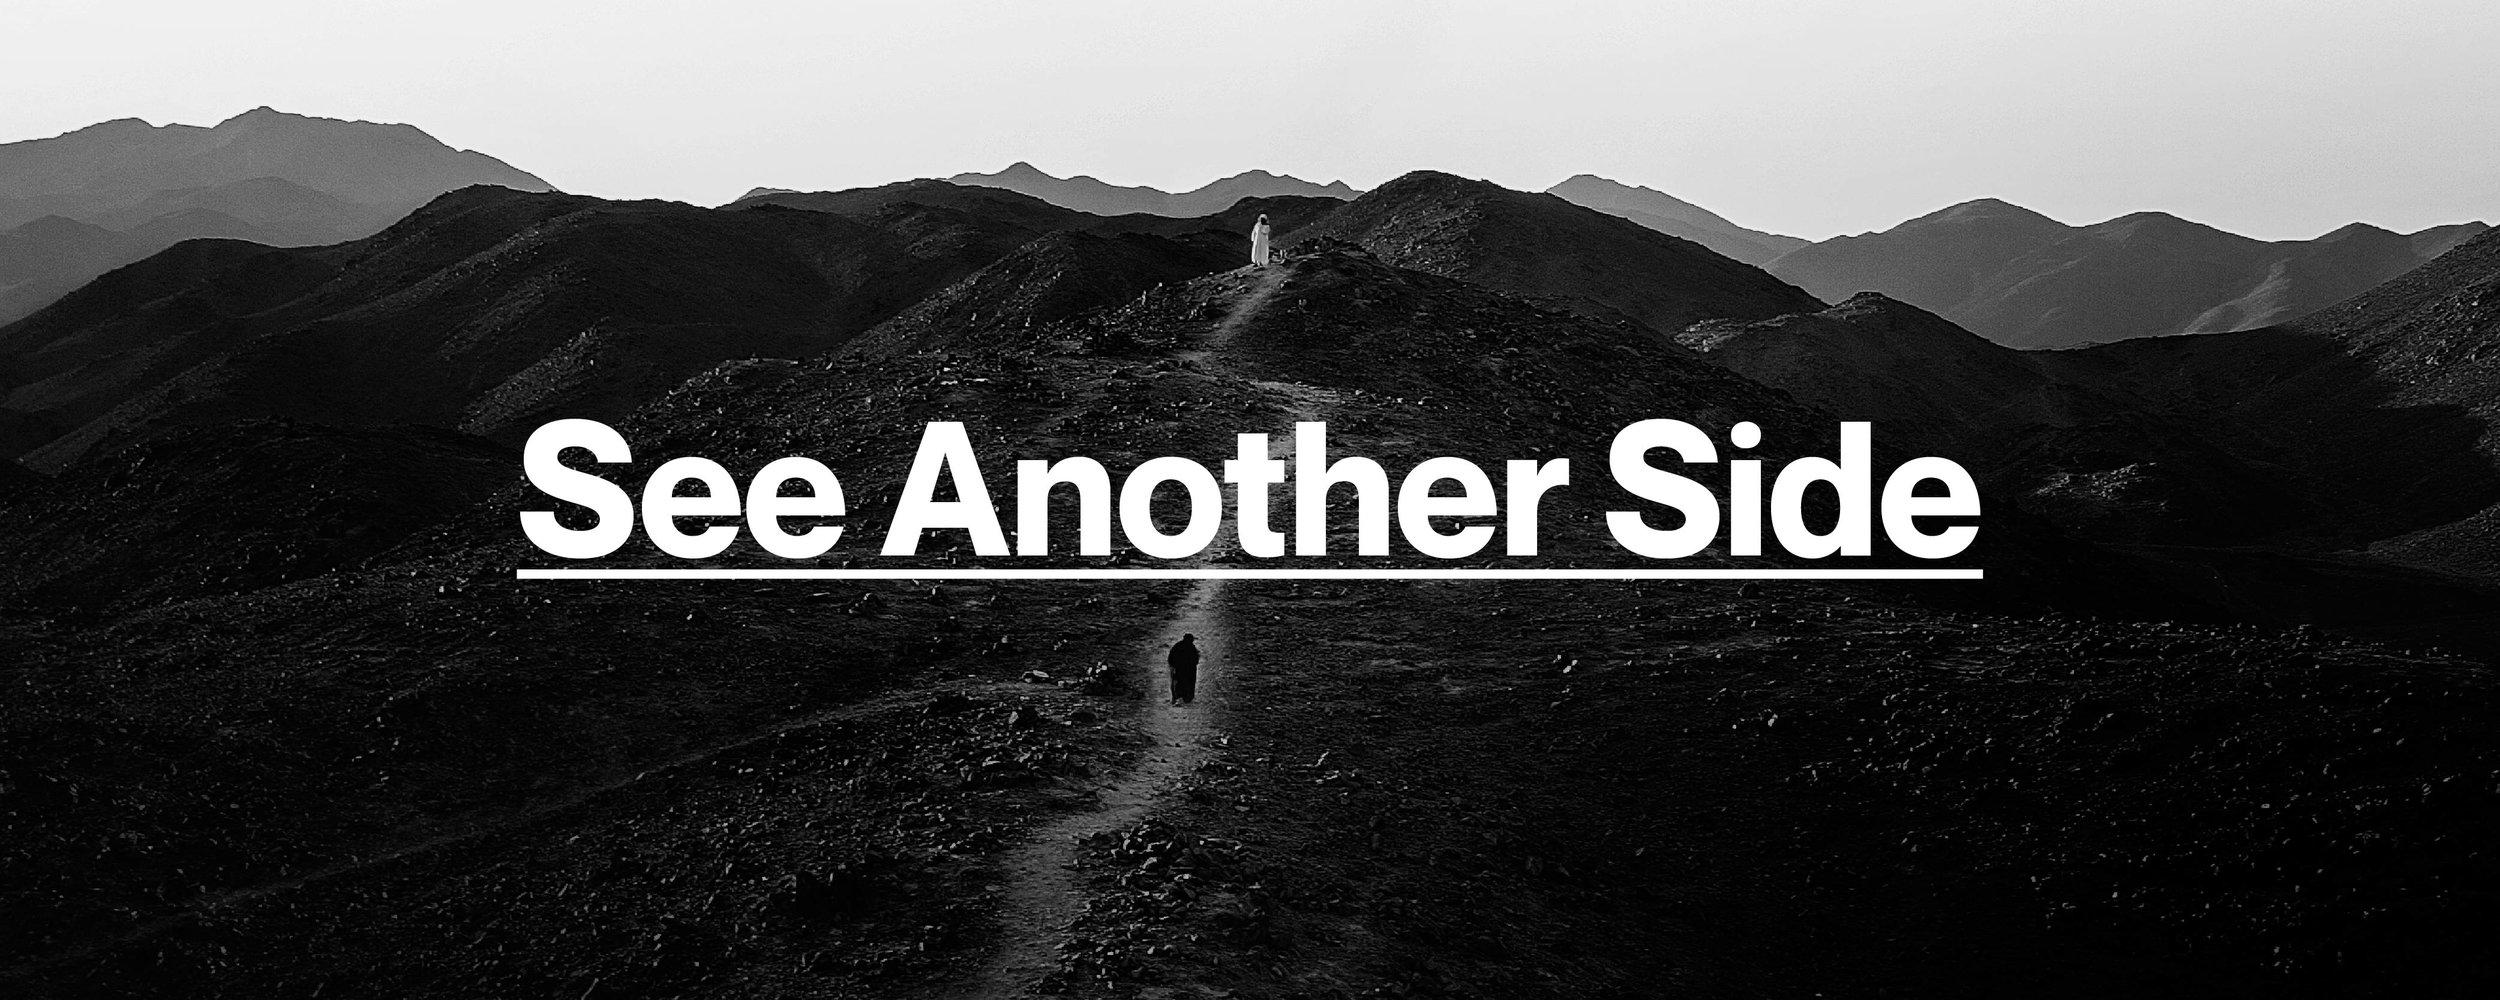 SeeAnotherSide Website Banner-04.jpg